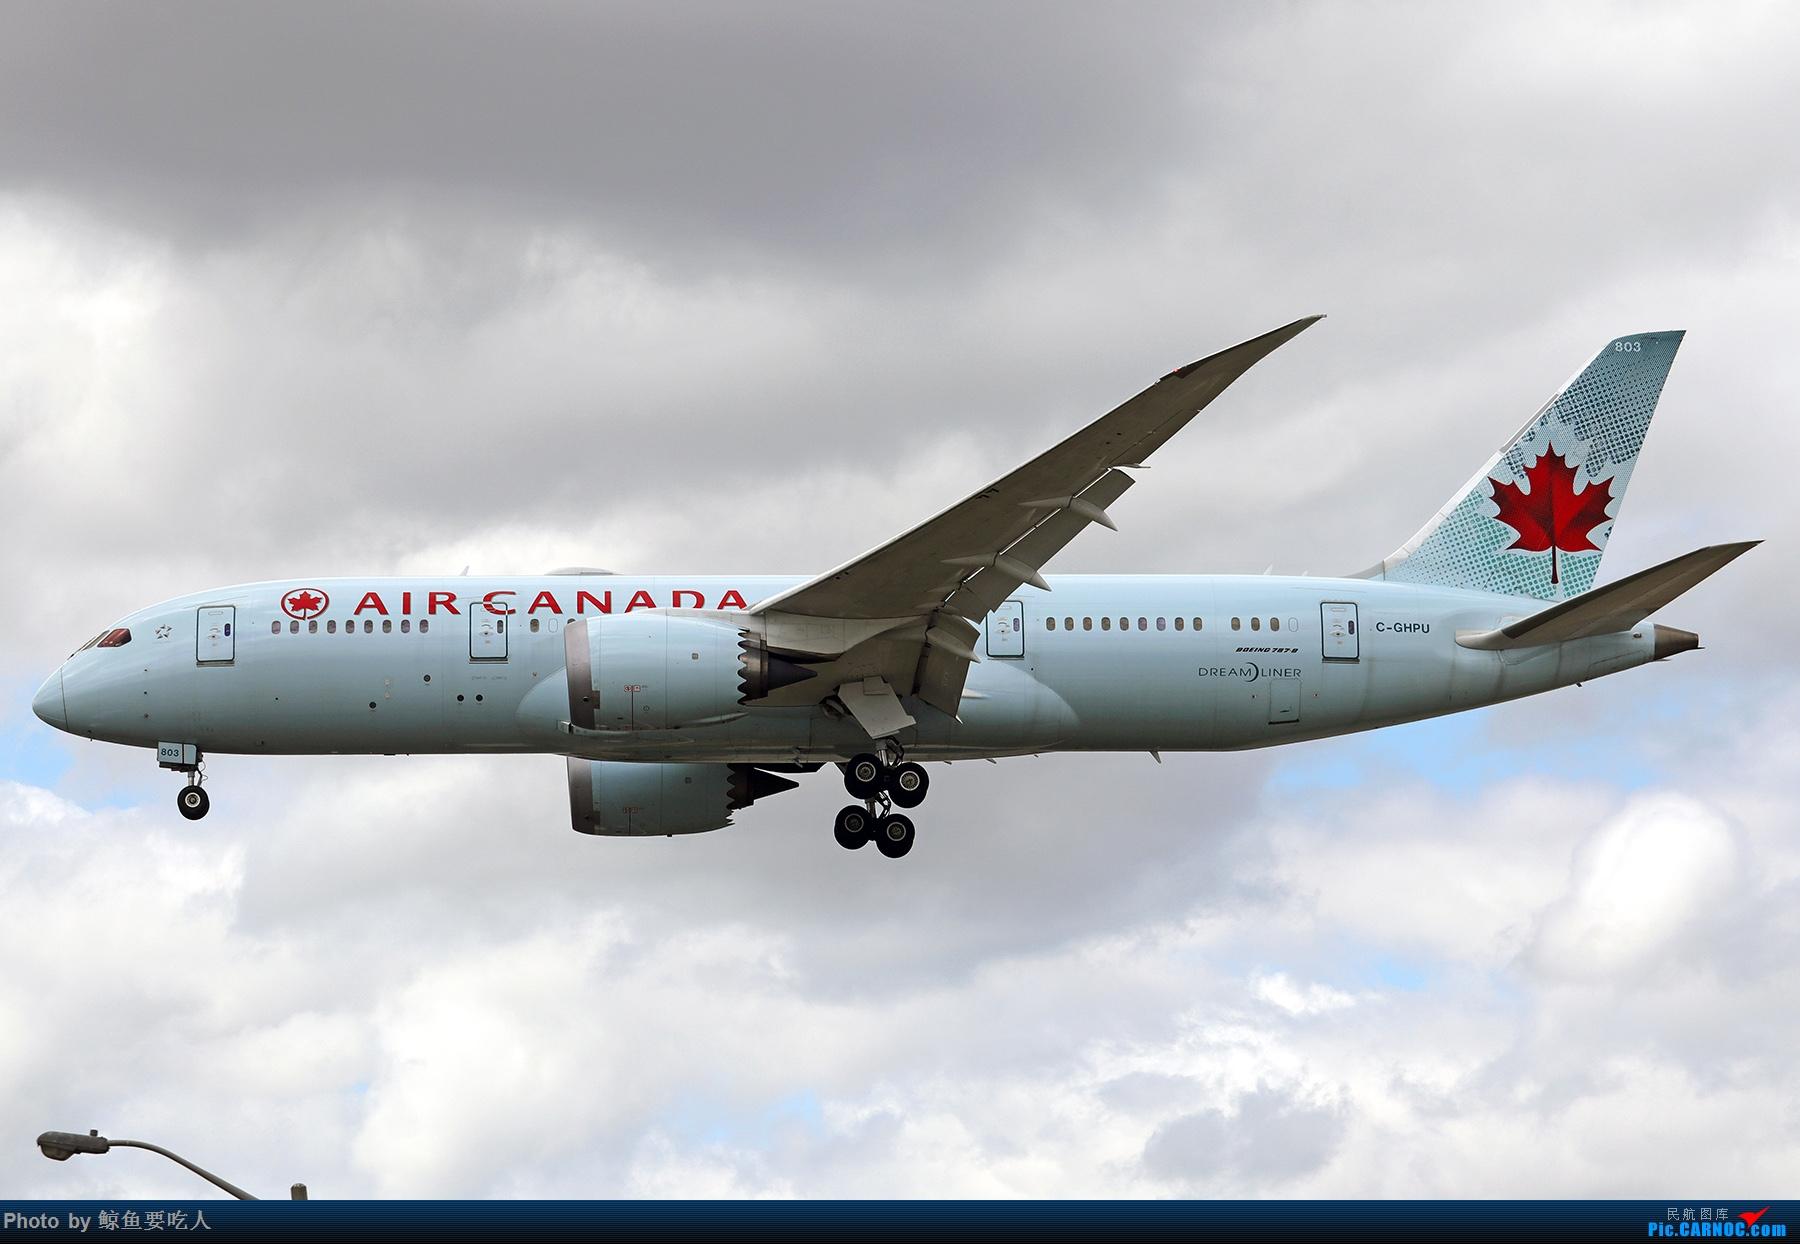 Re:【多图党】见证疫情后逐步的恢复,加拿大夏日多伦多皮尔逊机场拍机~ 乐见诸航空公司复航多伦多 BOEING 787-8 C-GHPU 多伦多皮尔逊国际机场